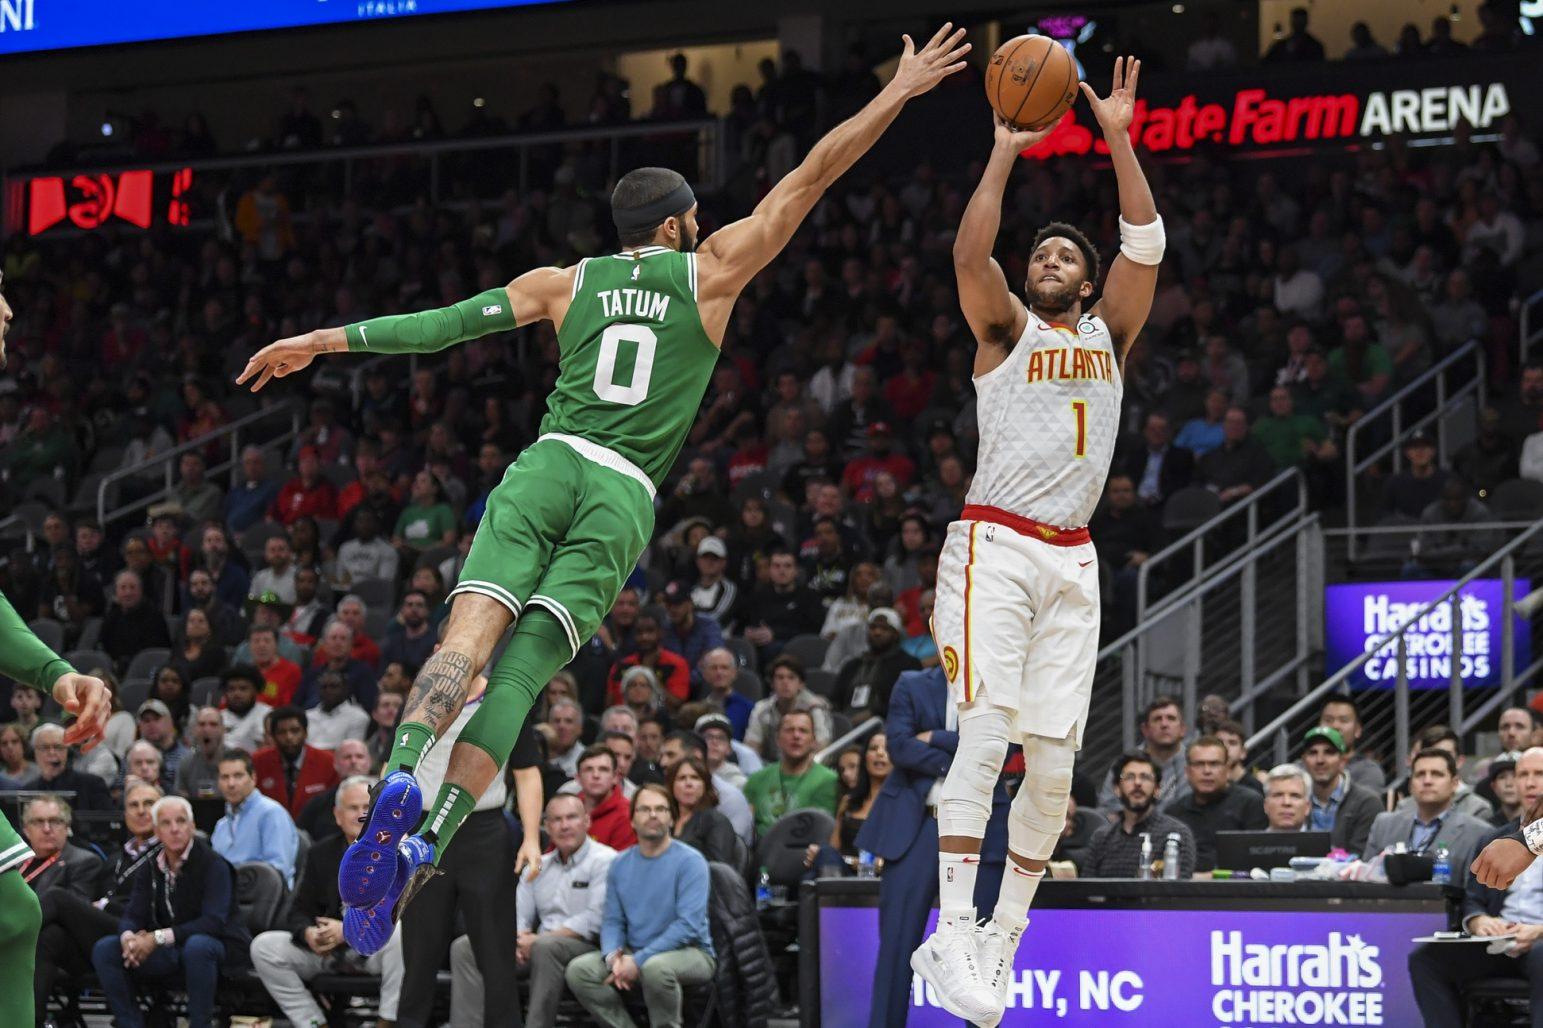 Recap: Celtics beat Hawks in fast-paced shootout